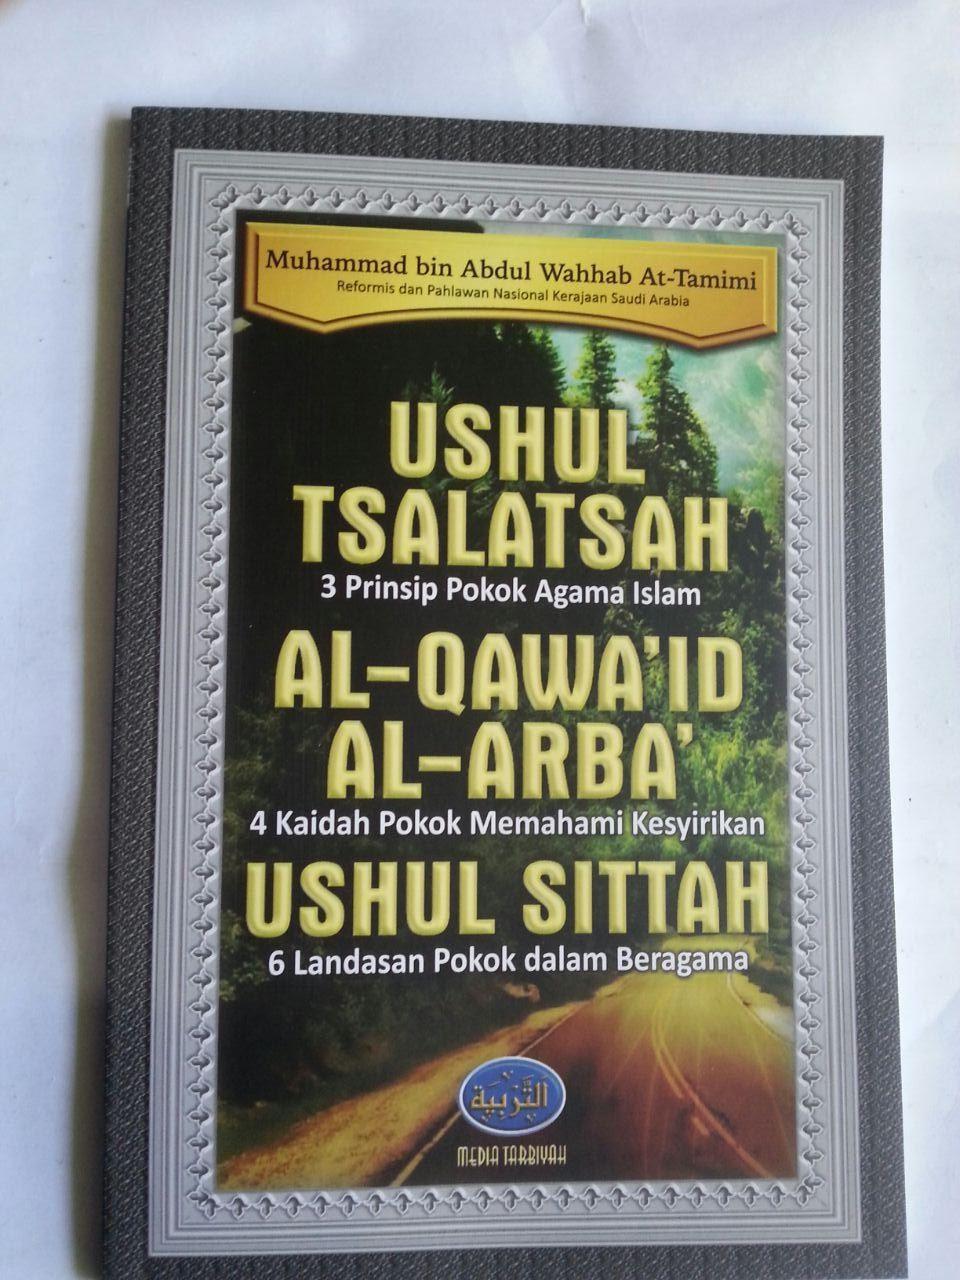 Buku Ushul Tsalatsah Al-Qawa'id Al-Arba' Ushul Sittah cover